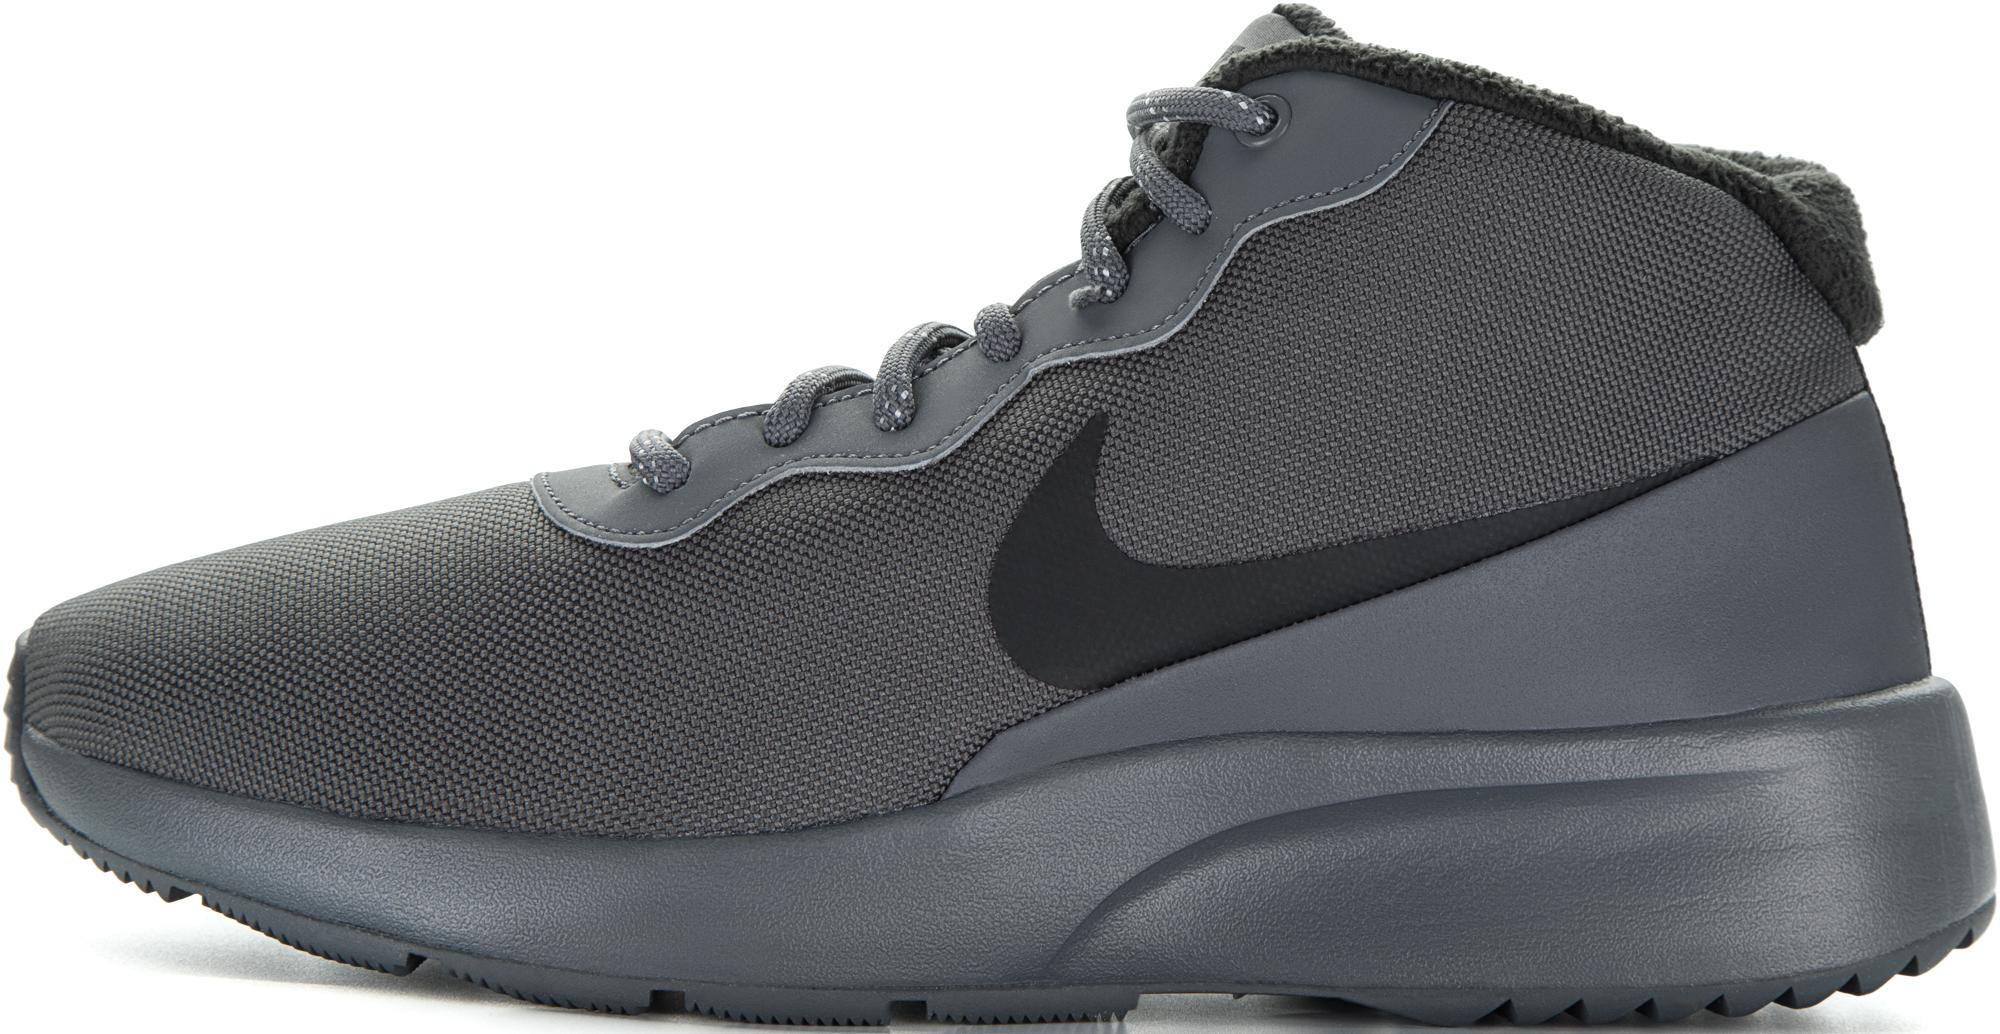 цена Nike Кроссовки мужские Nike Tanjun Chukka, размер 44 онлайн в 2017 году